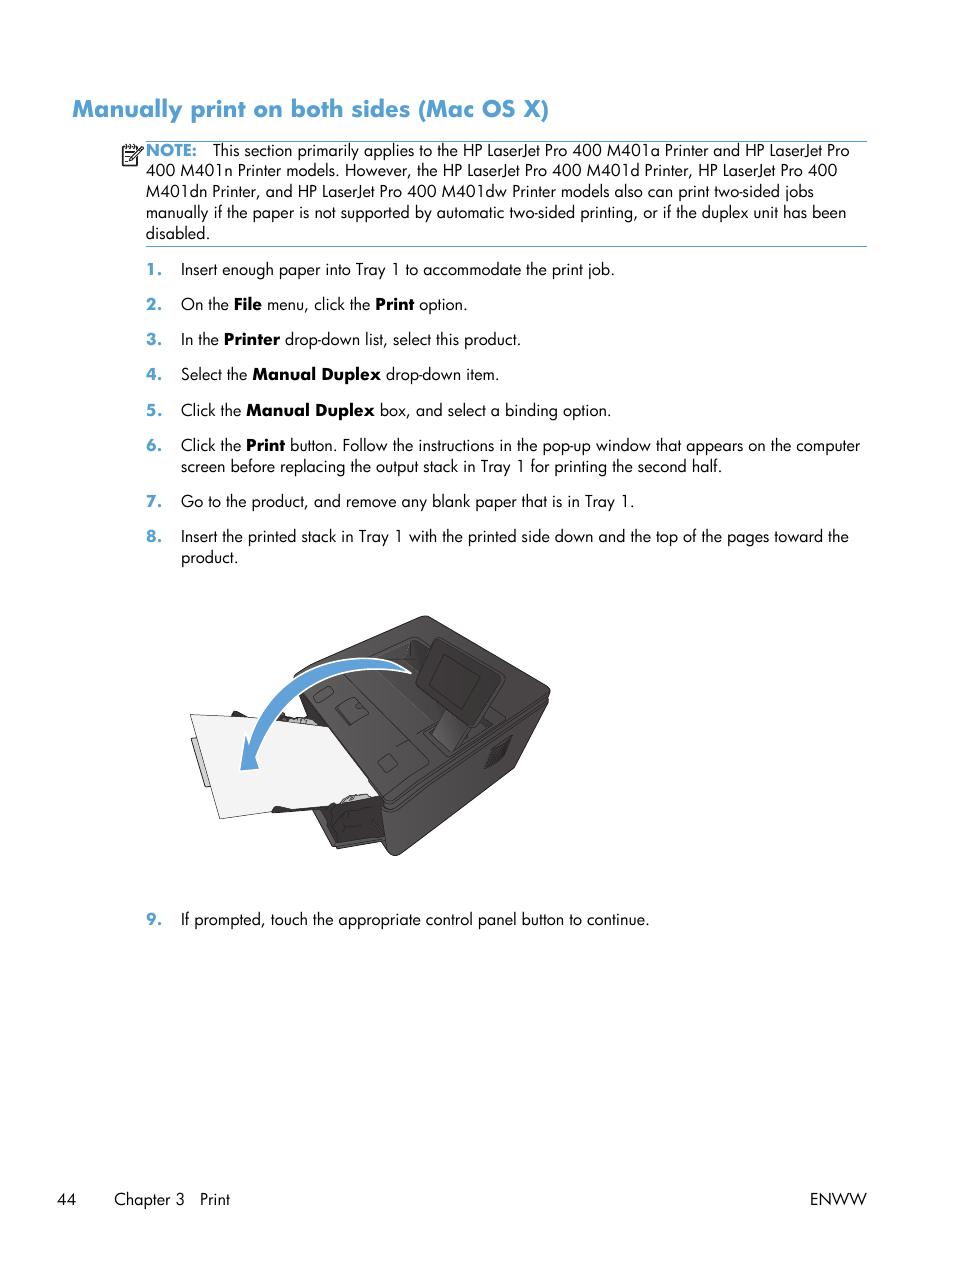 Manually print on both sides (mac os x)   HP LaserJet Pro 400 Printer